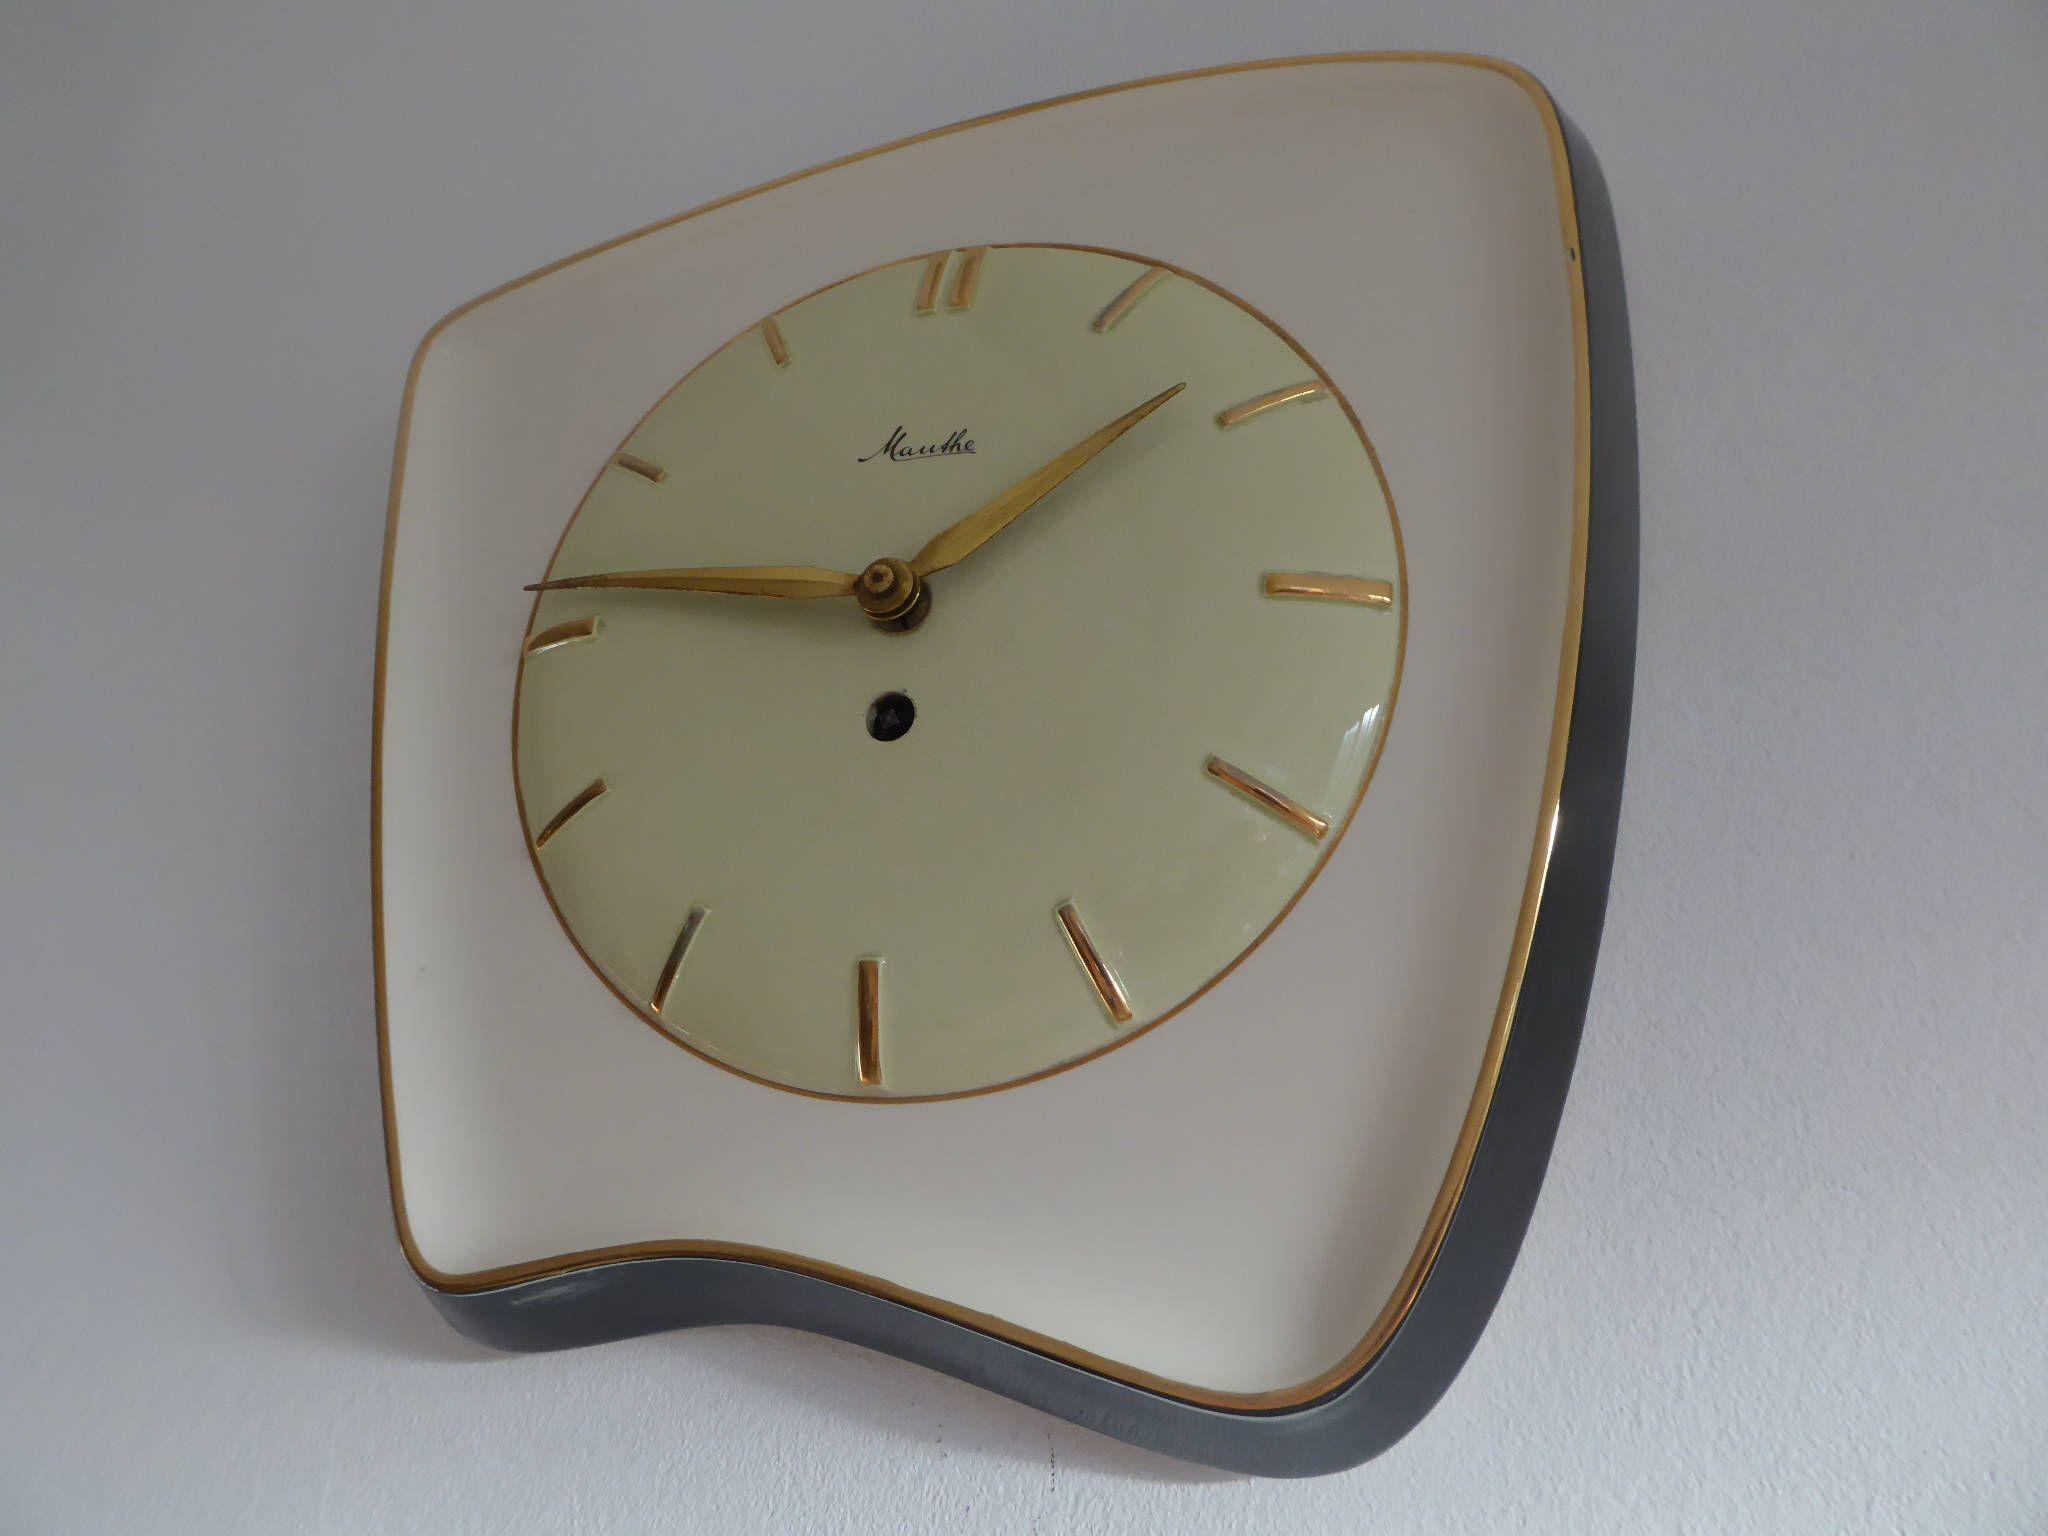 Küchenuhr Retro ~ Fantastic mauthe german made wall clock küchenuhr rockabilly